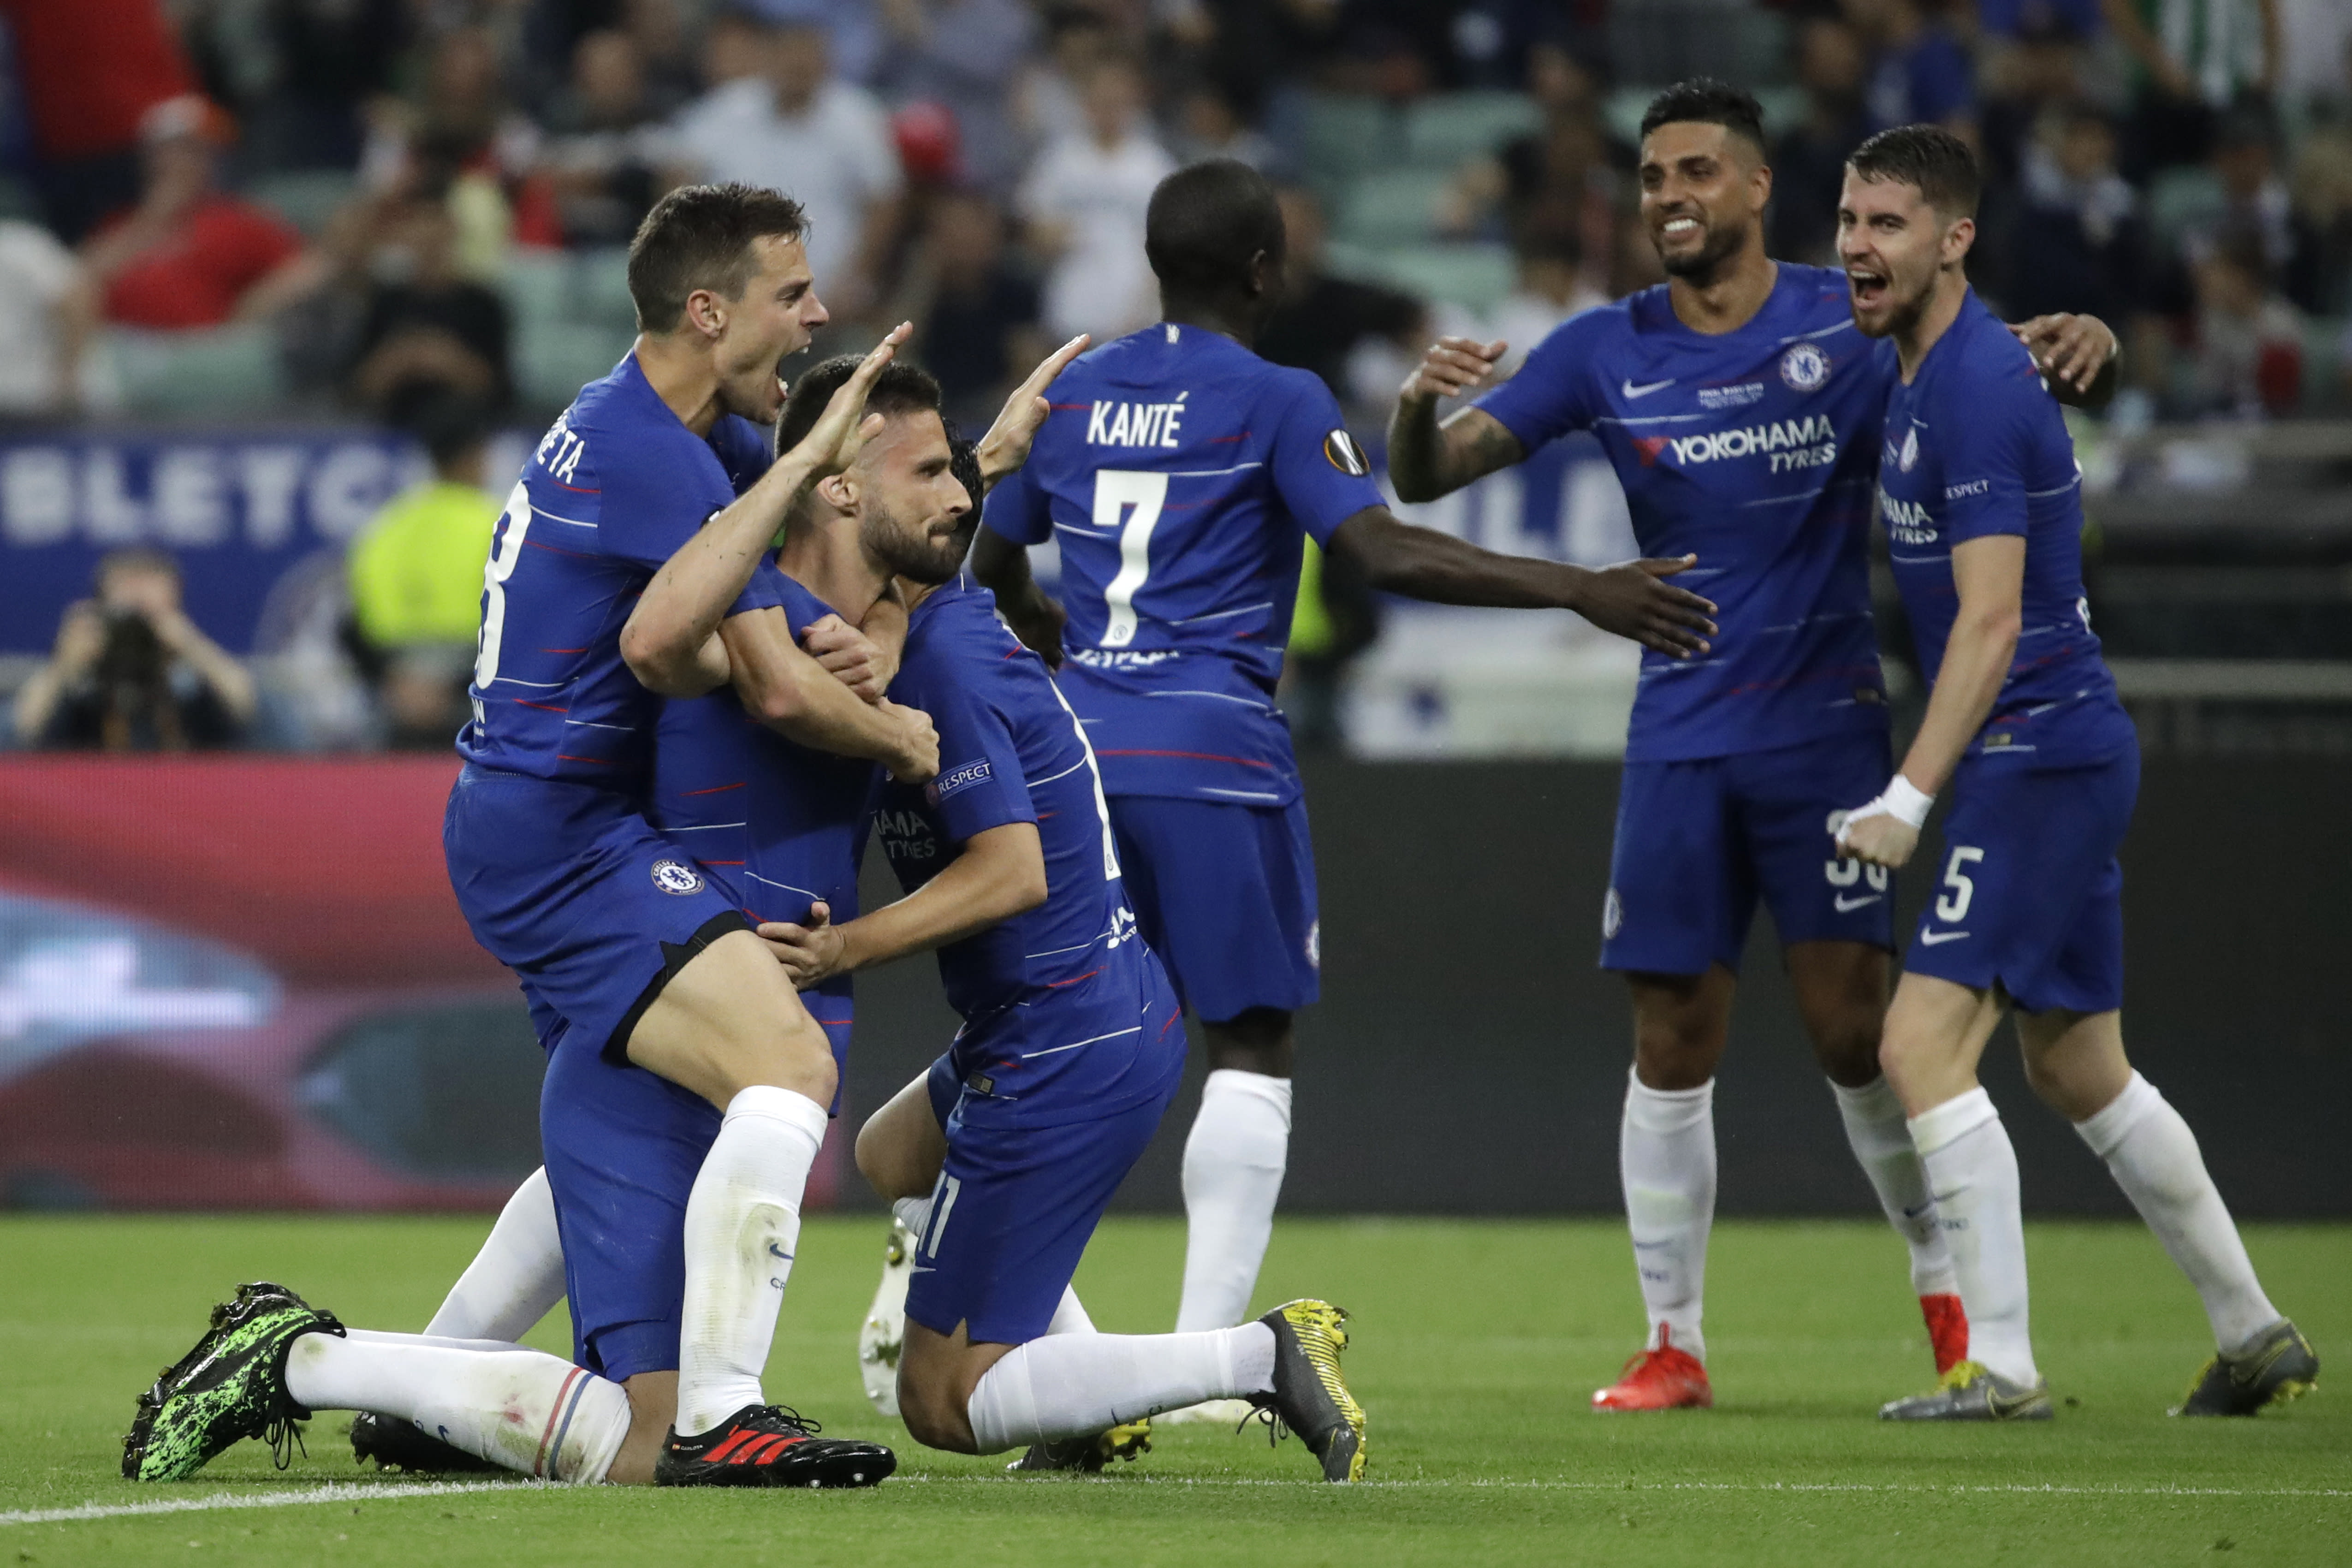 56c615e39 Hazard scores 2 as Chelsea beats Arsenal 4-1 in EL final